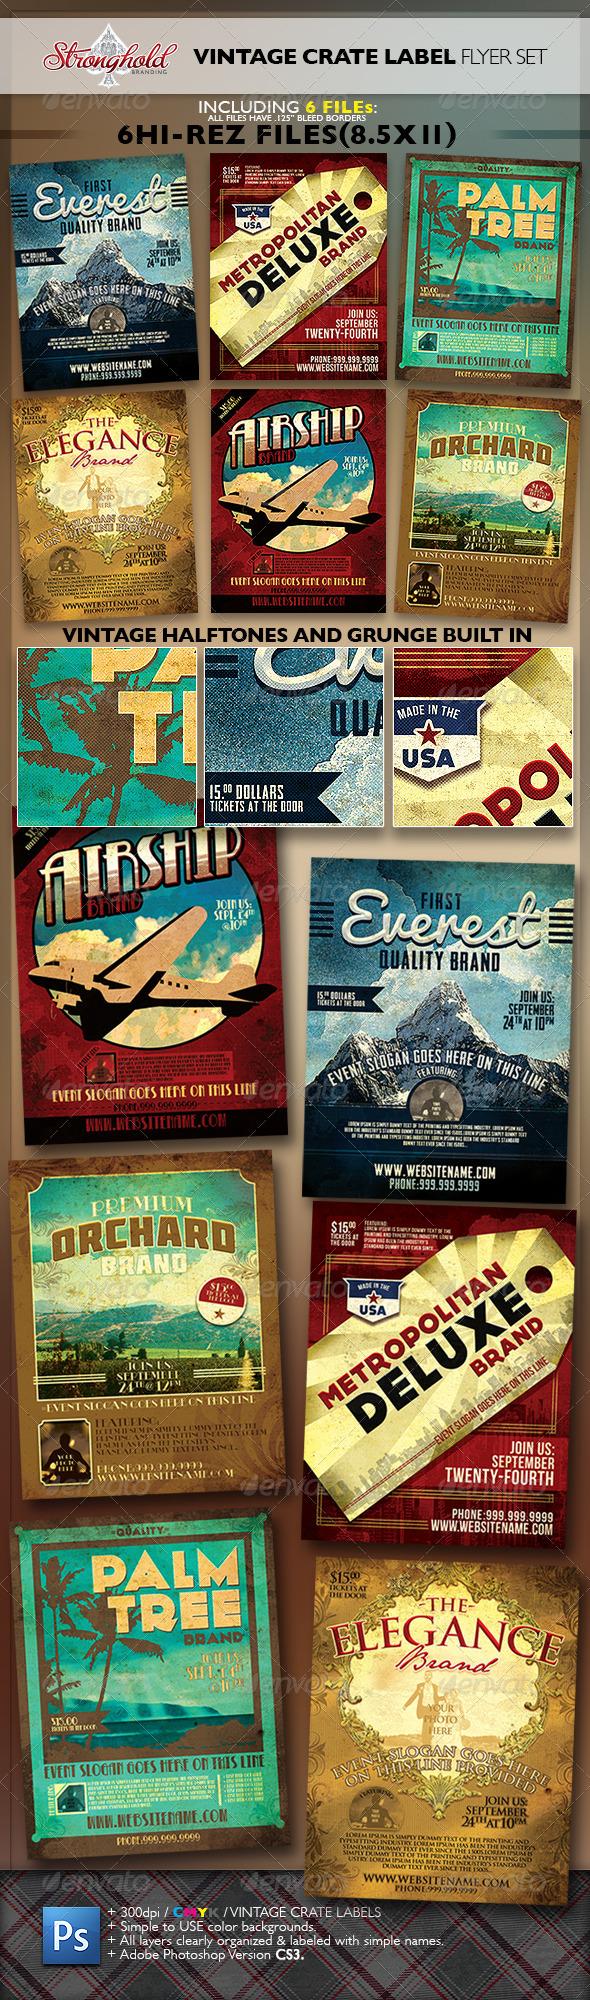 Vintage Fruit Crate Label Flyer Template Set - Flyers Print Templates